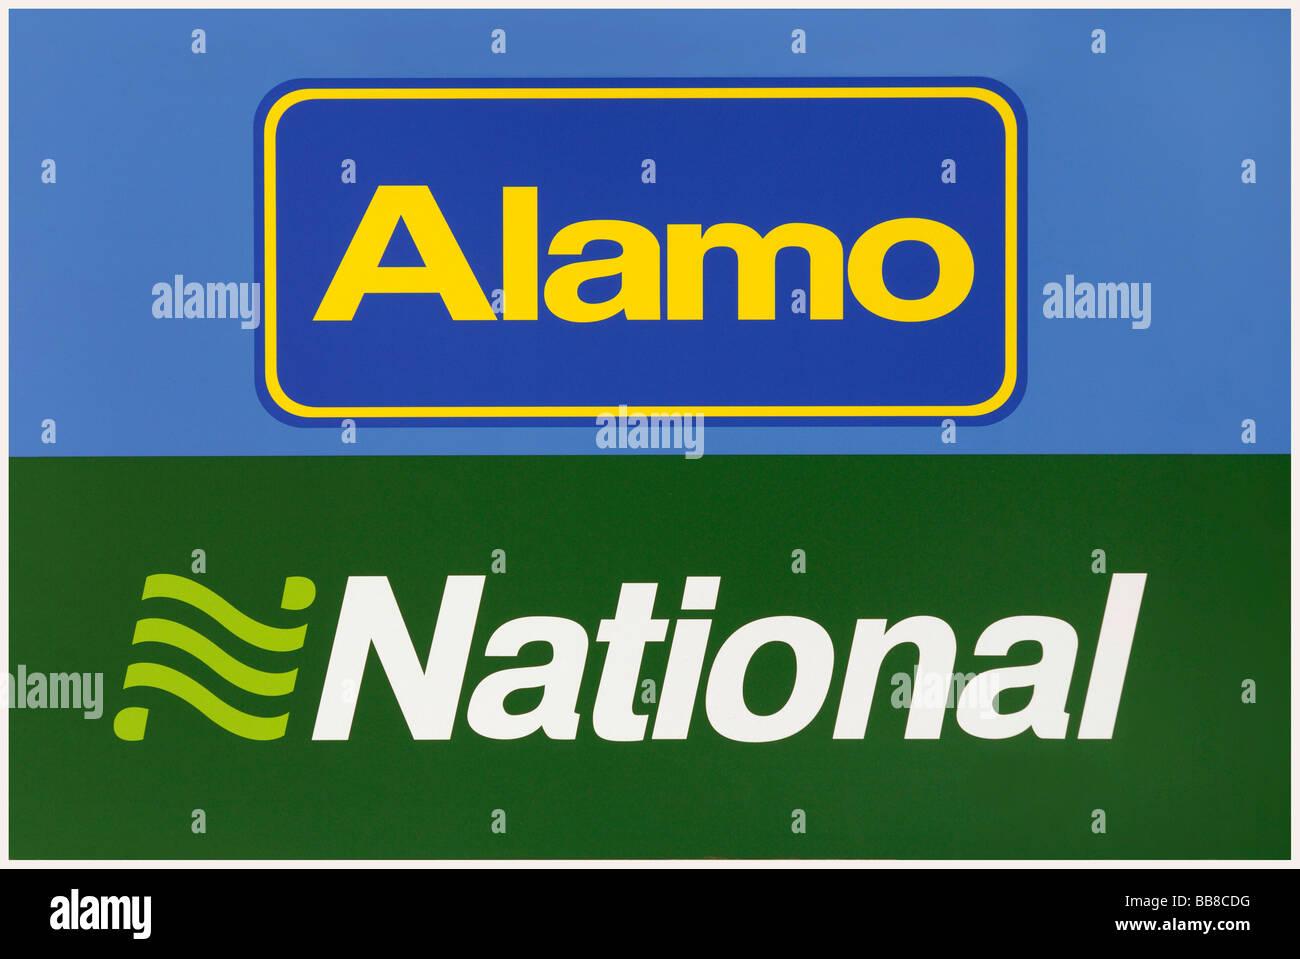 Alamo National Autovermietung, Mietwagen Stockbild